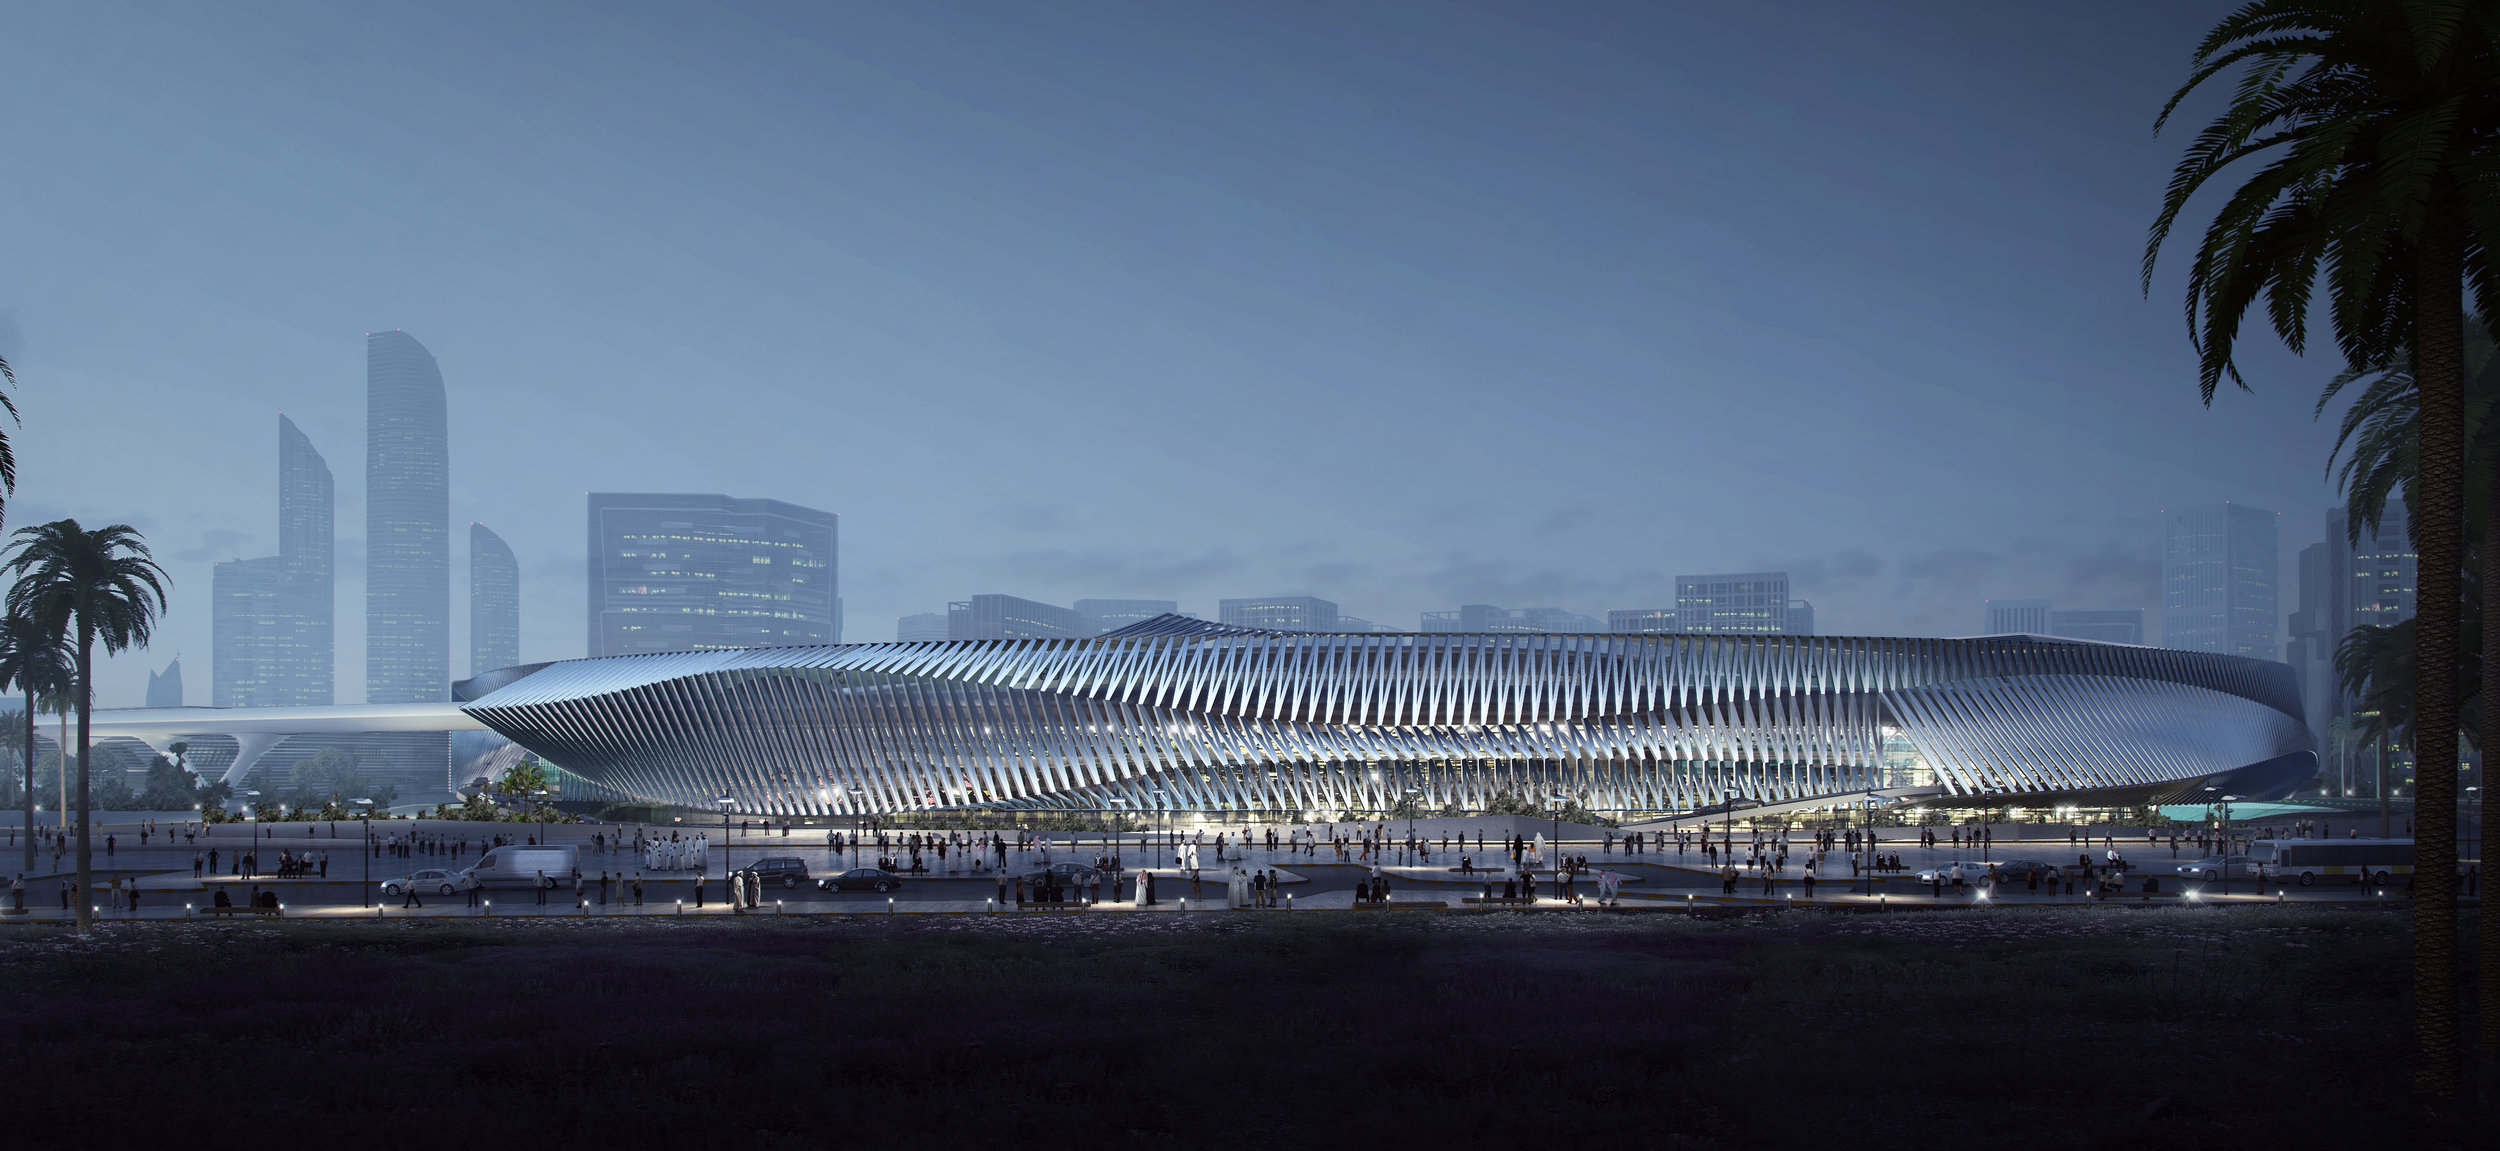 AN.ONYMOUS HYPERLOOP ABU DHABI STATION